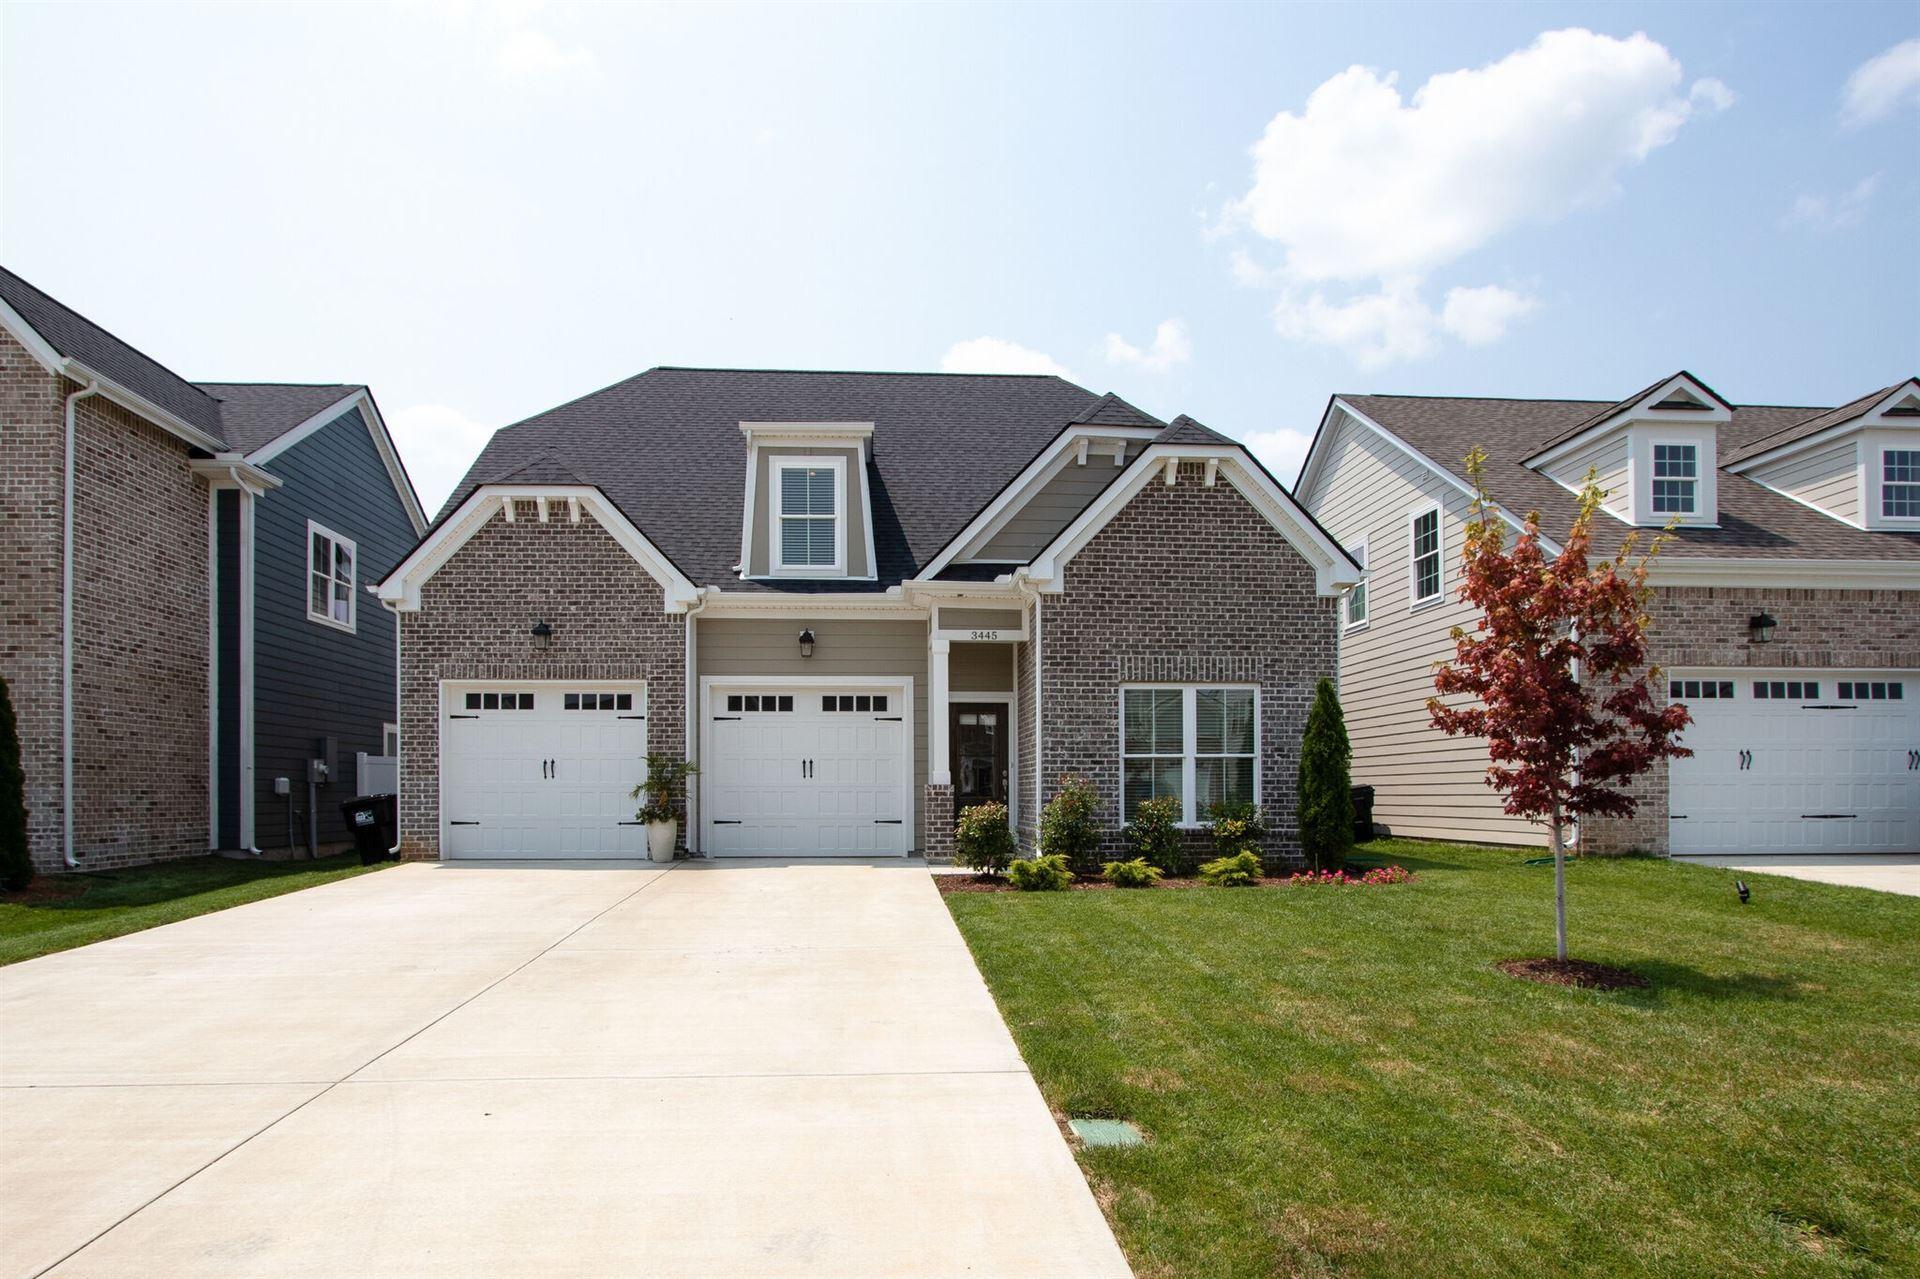 3445 Caroline Farms Dr, Murfreesboro, TN 37129 - MLS#: 2275106